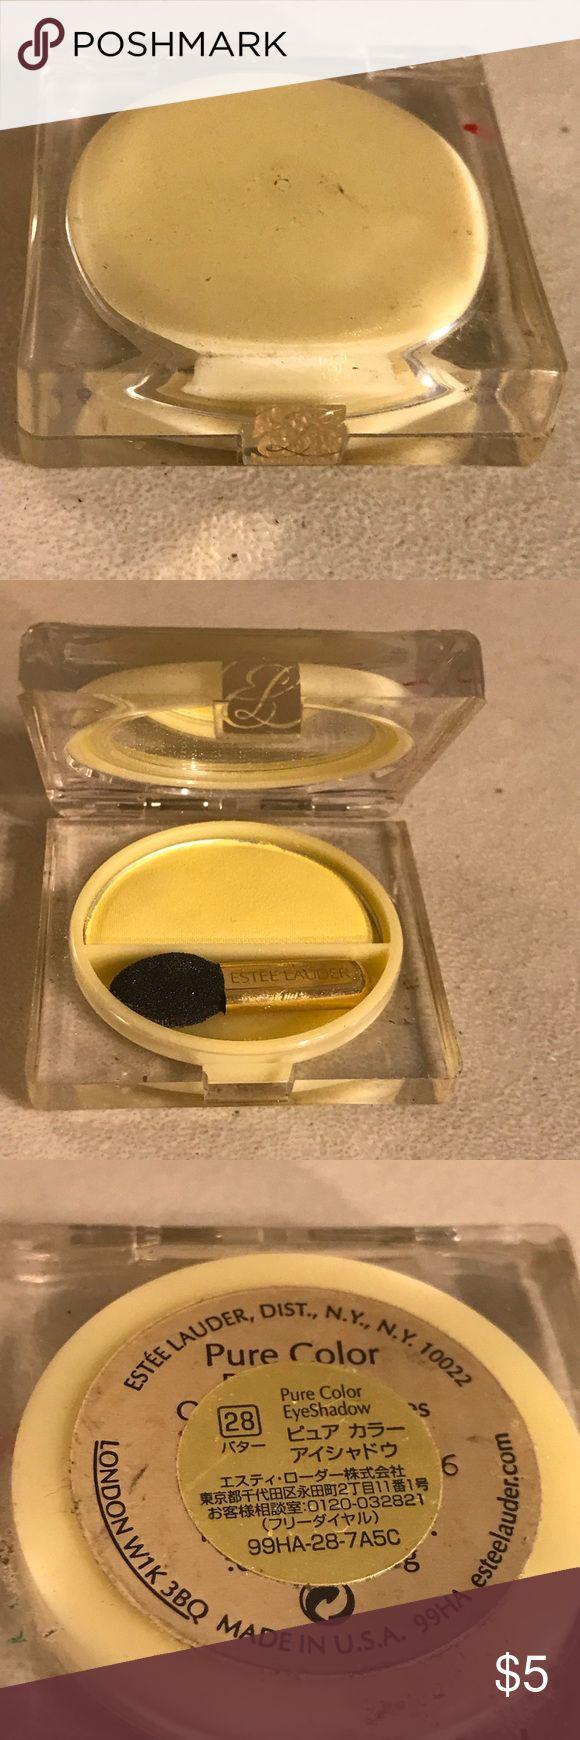 Estée Lauder pure color eyeshadow Estée Lauder pure color eyeshadow , used. Thanks for checking out Luxury1cosmetics!! Offers are welcomed, bundles are discounted!!! Estee Lauder Makeup Eyeshadow